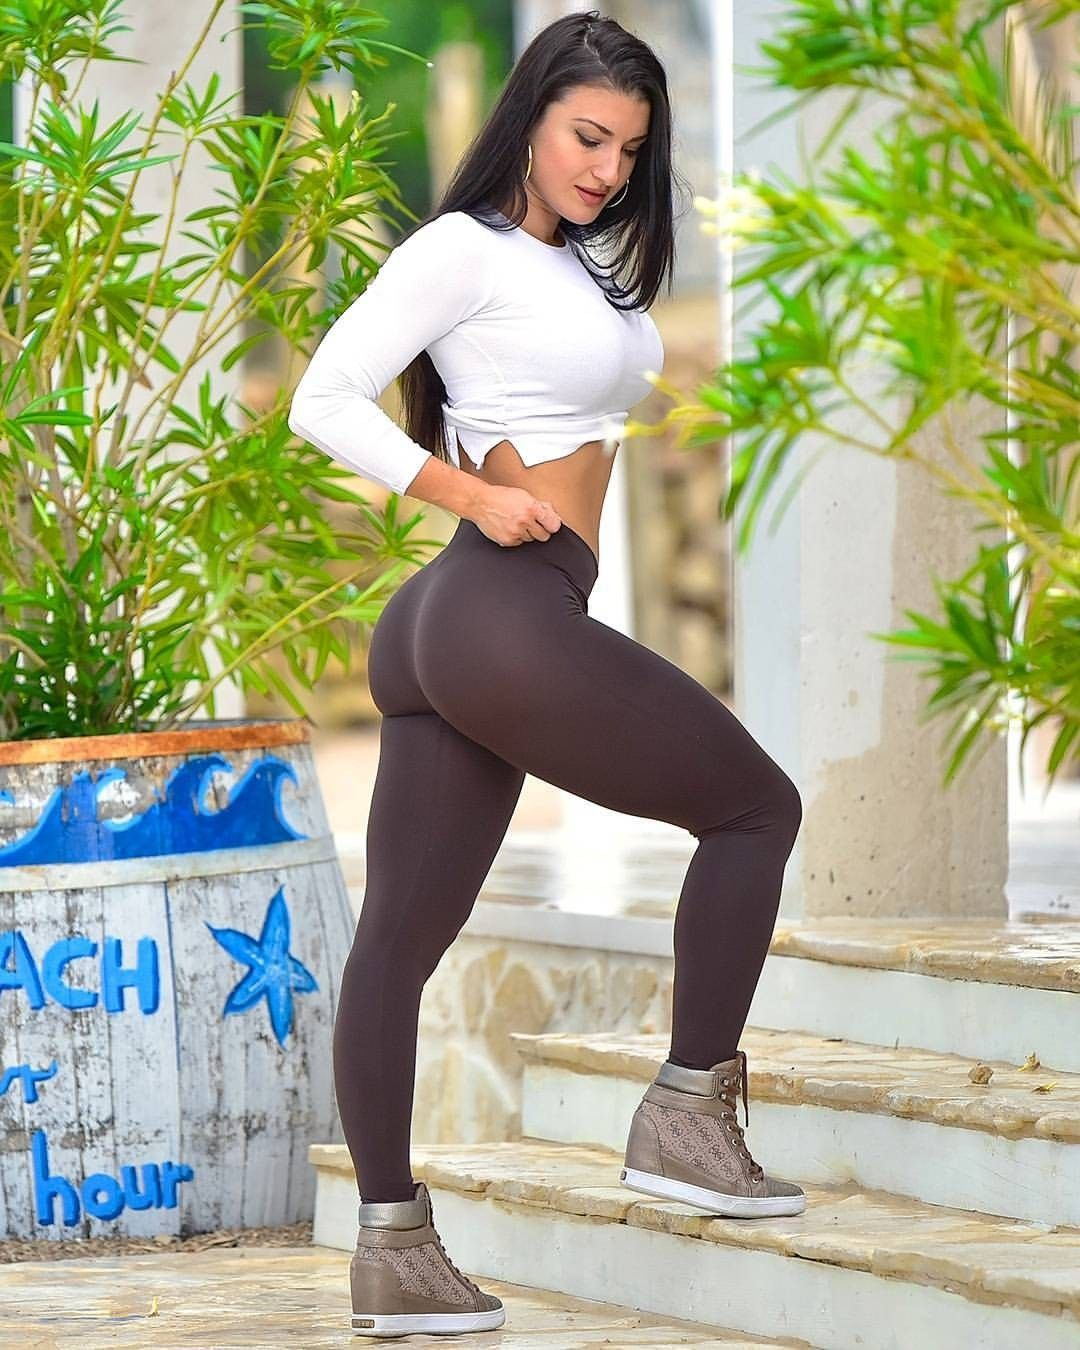 276cb58486c65 Hot, Butt Workout, Fitness Models, Leggings, Legs, Pants, Fitness Clothing